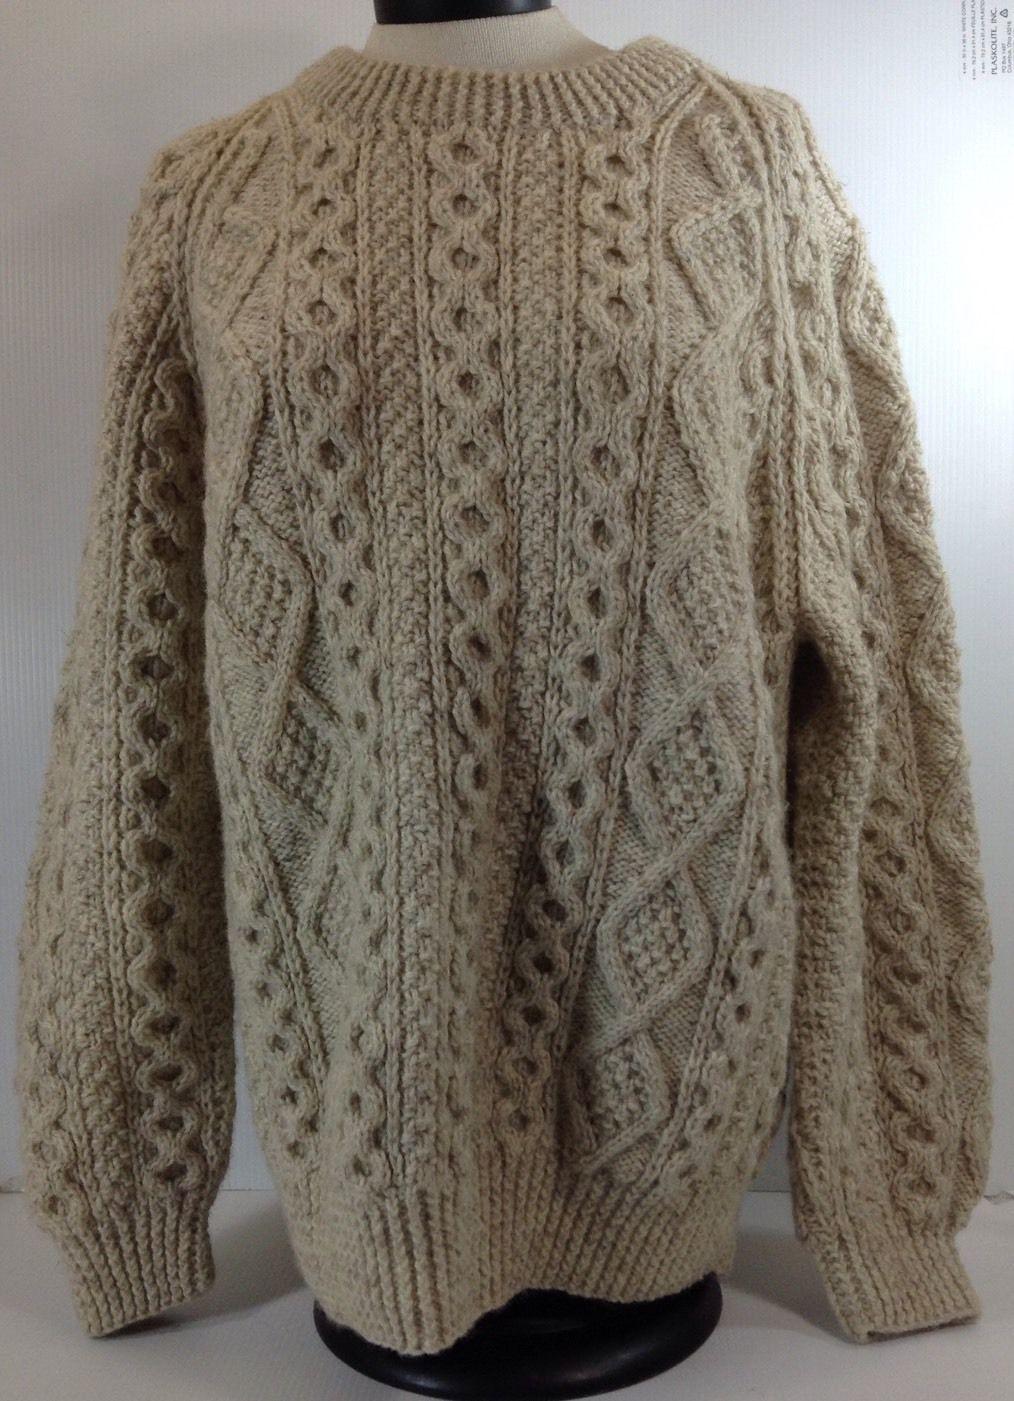 Irish Cable Knit Sweater Patterns : Irish Cable Knit Sweater Handmade Beige Tan Bulky Size XL Robins Gener...